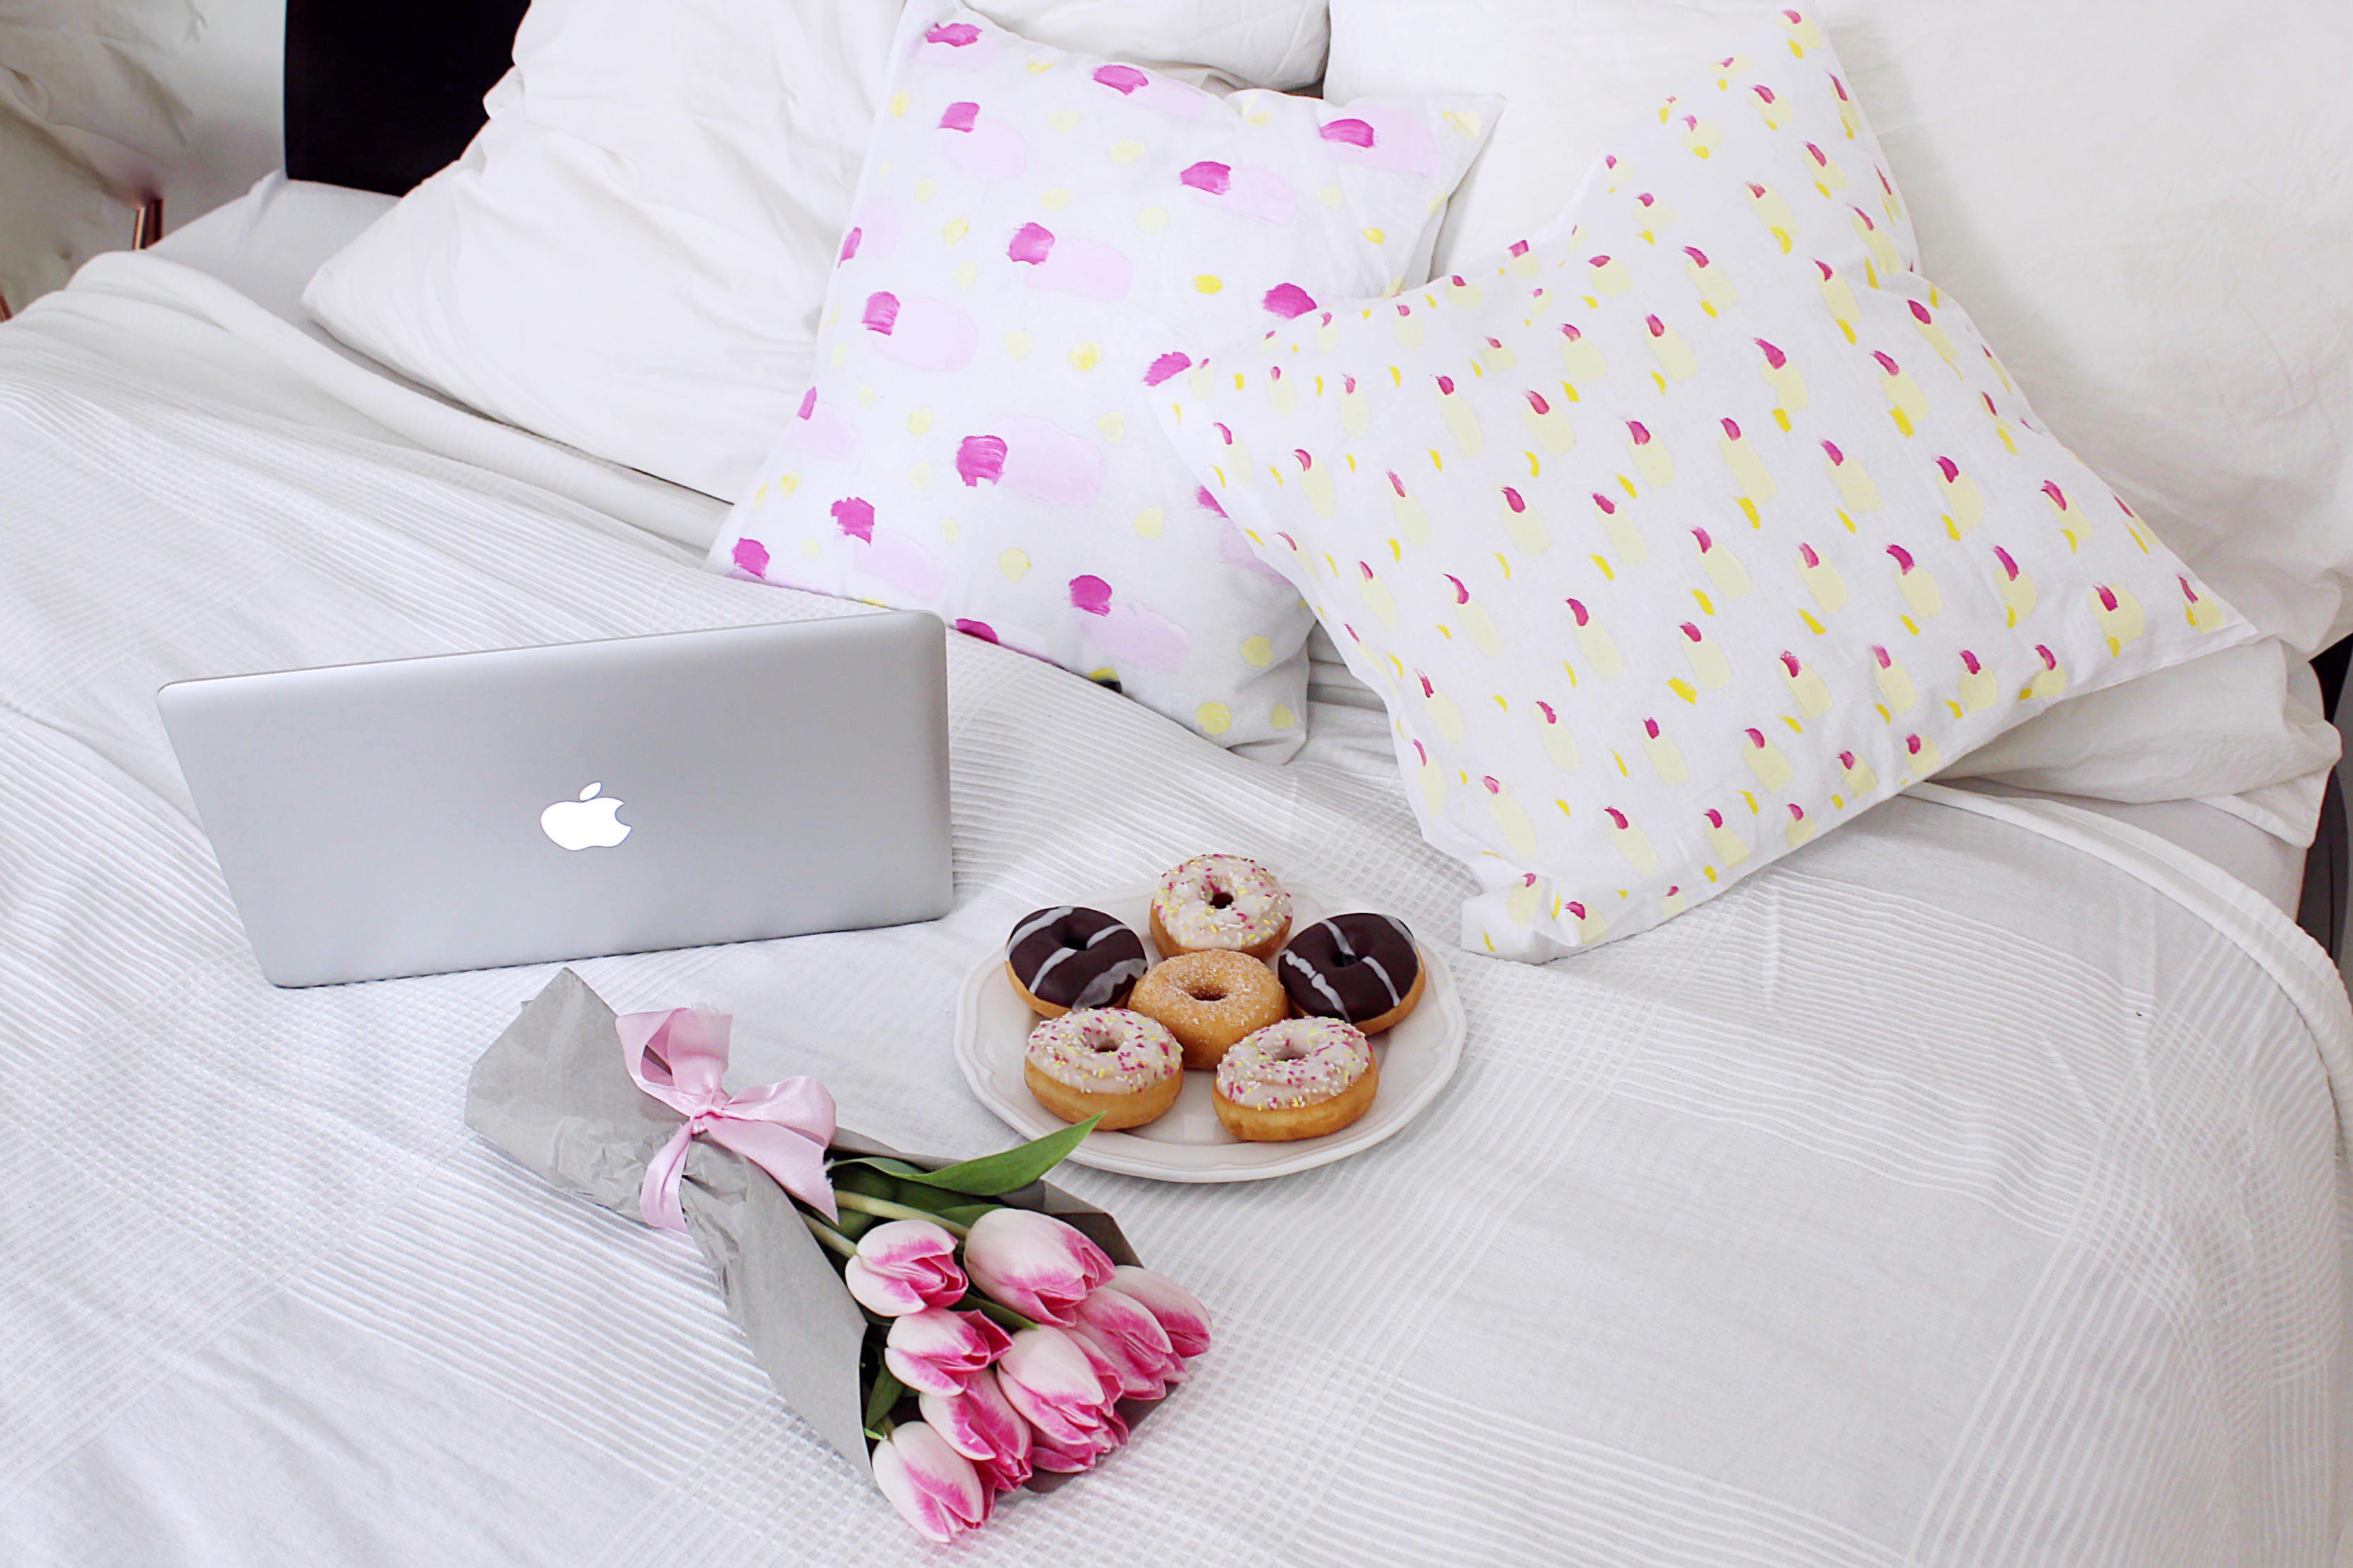 kissenbezug zum bemalen top seide ponge with kissenbezug. Black Bedroom Furniture Sets. Home Design Ideas